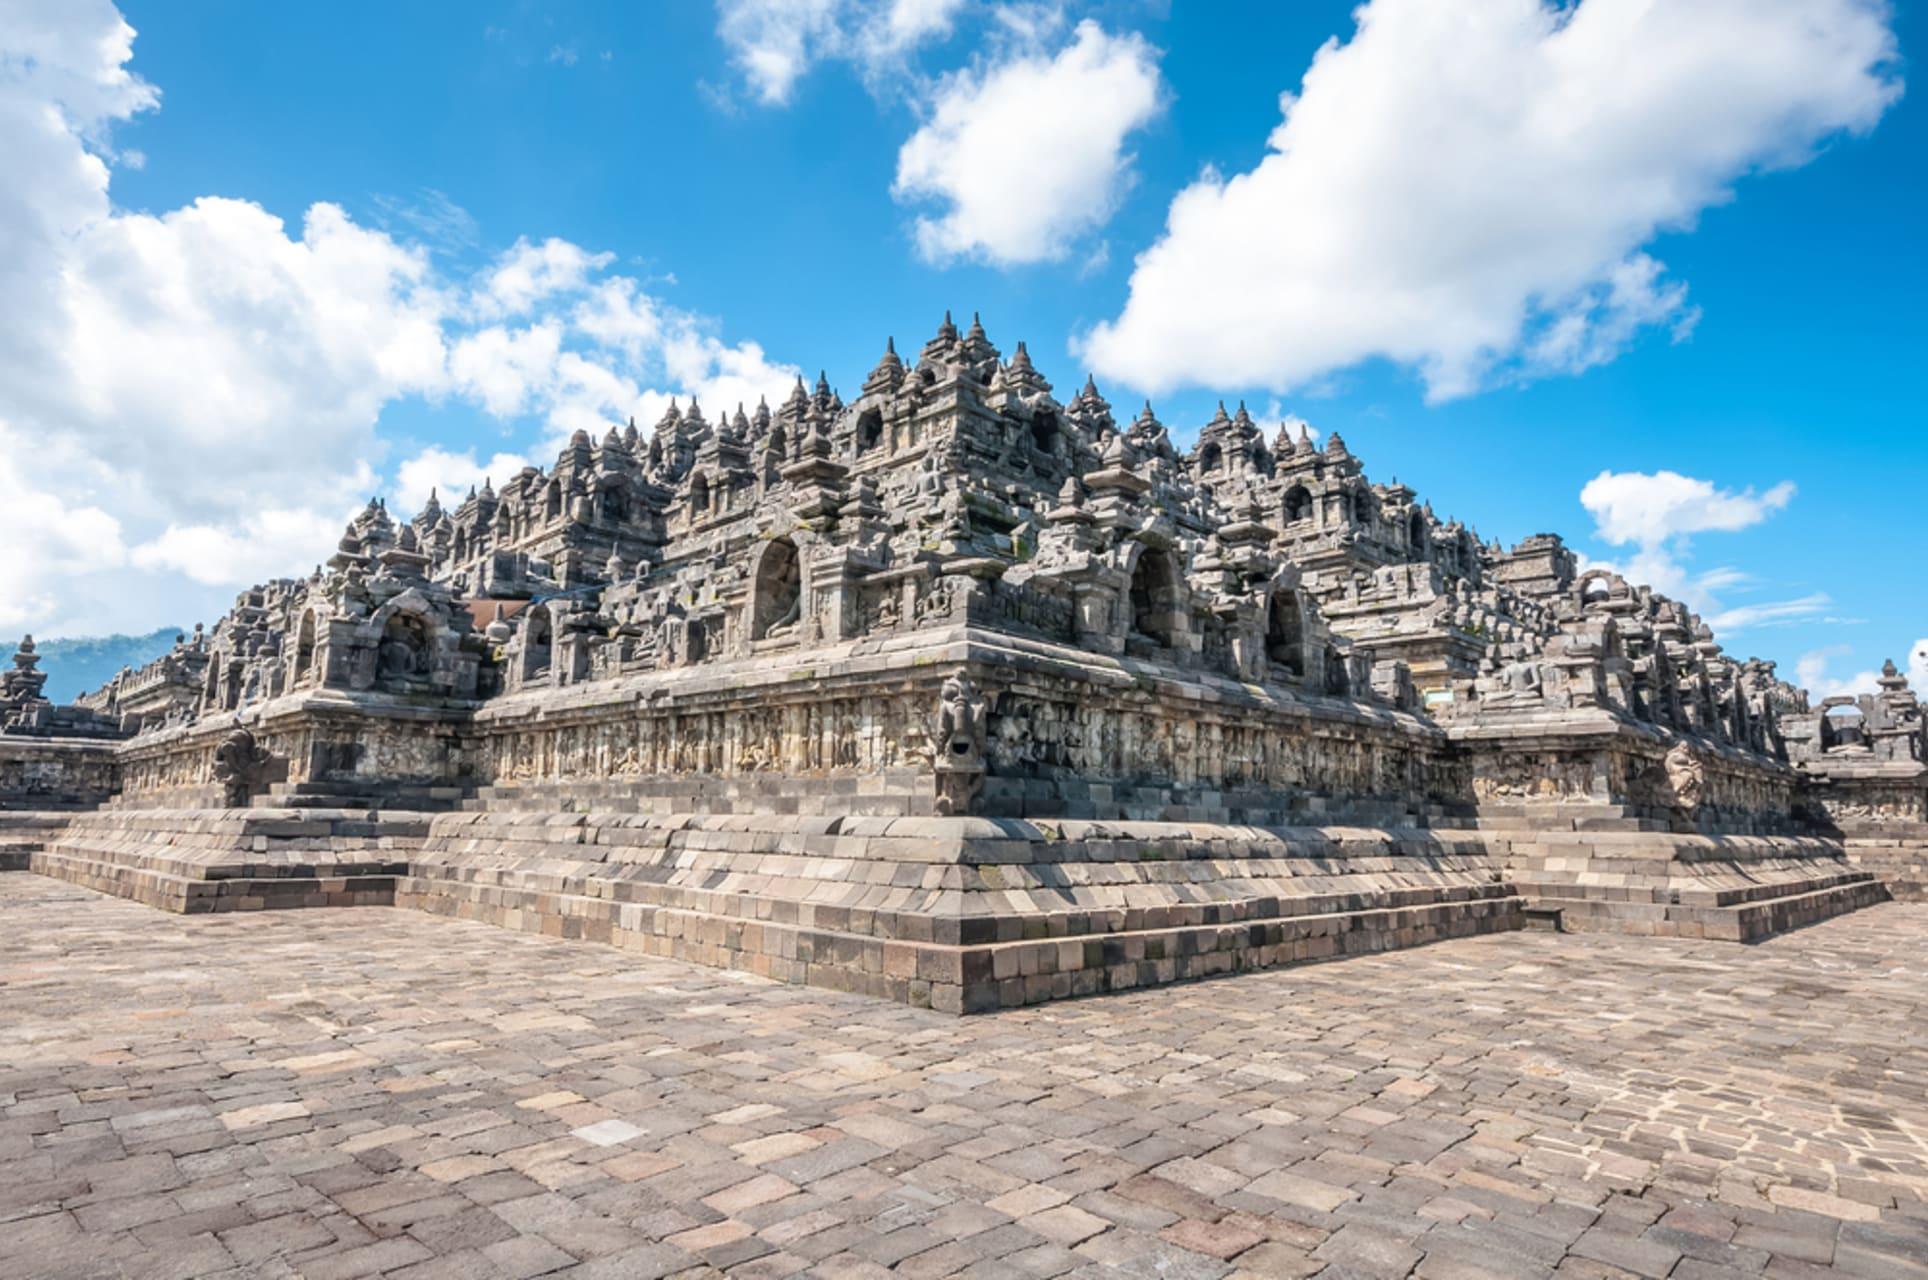 Yogyakarta - UNESCO World Heritage - Borobudur Temple: the Golden Paths of the Buddha